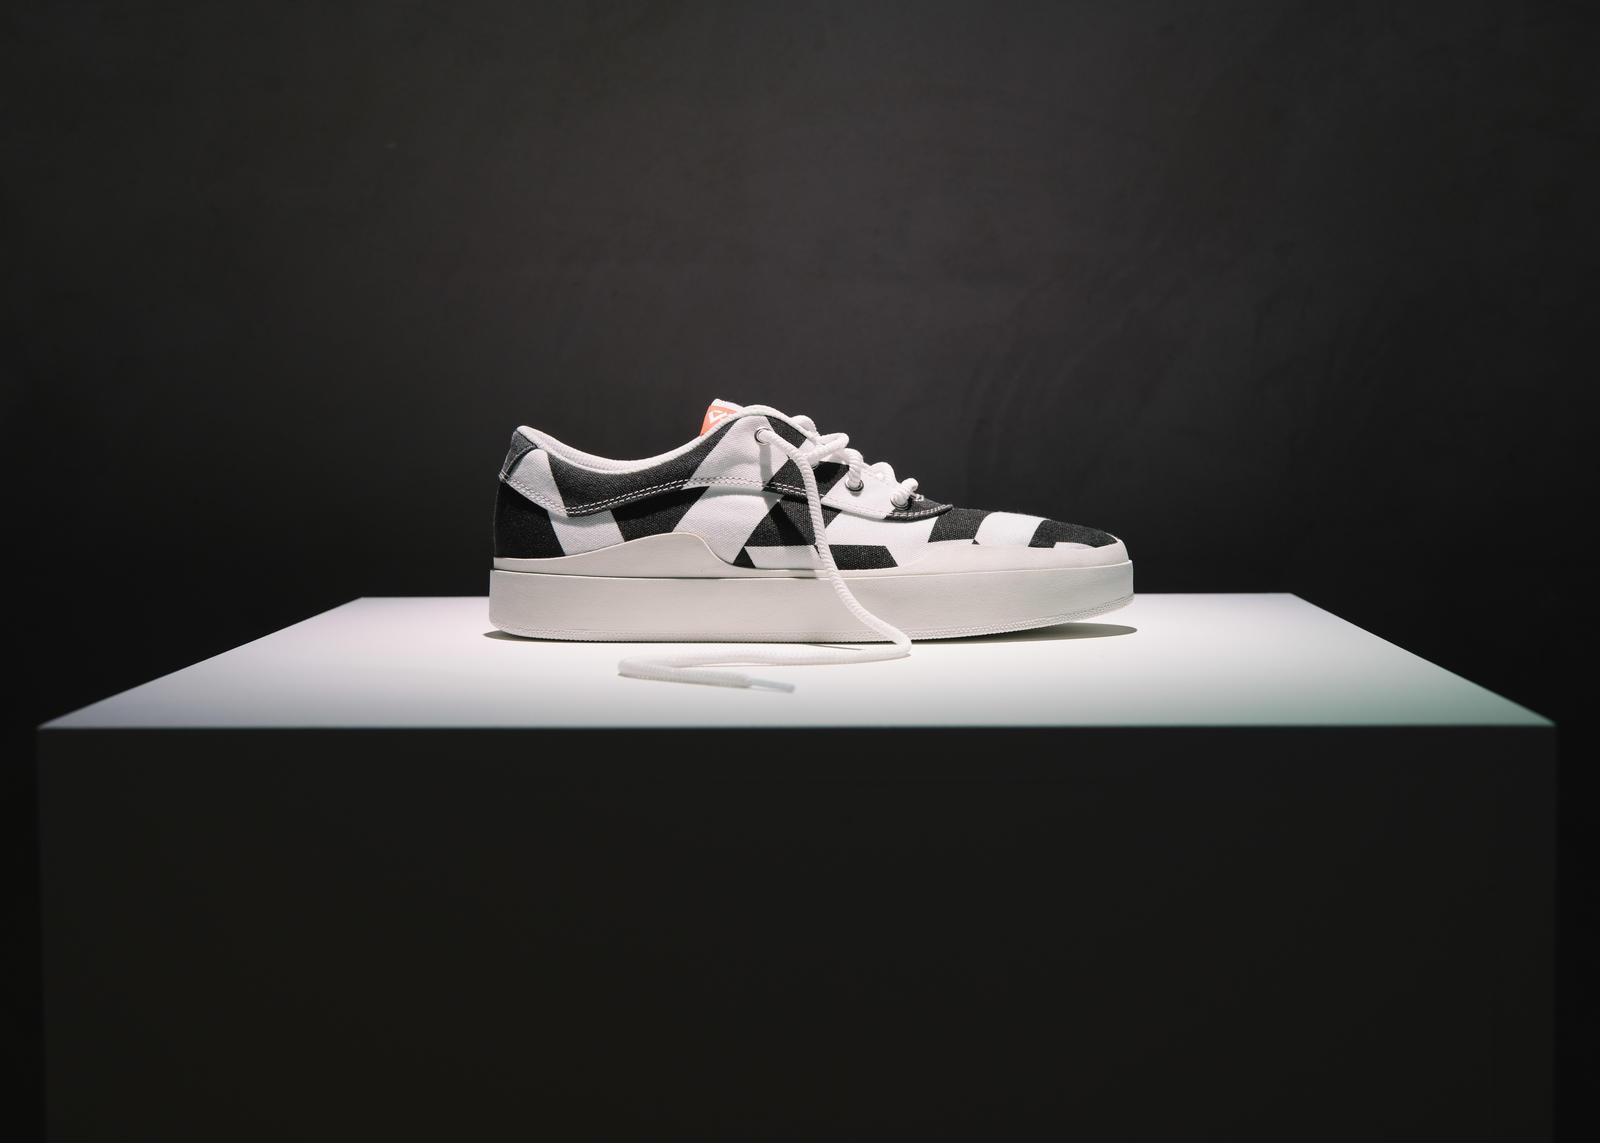 5bf329474a6 Jordan Brand Fall 2018 Preview - Nike News